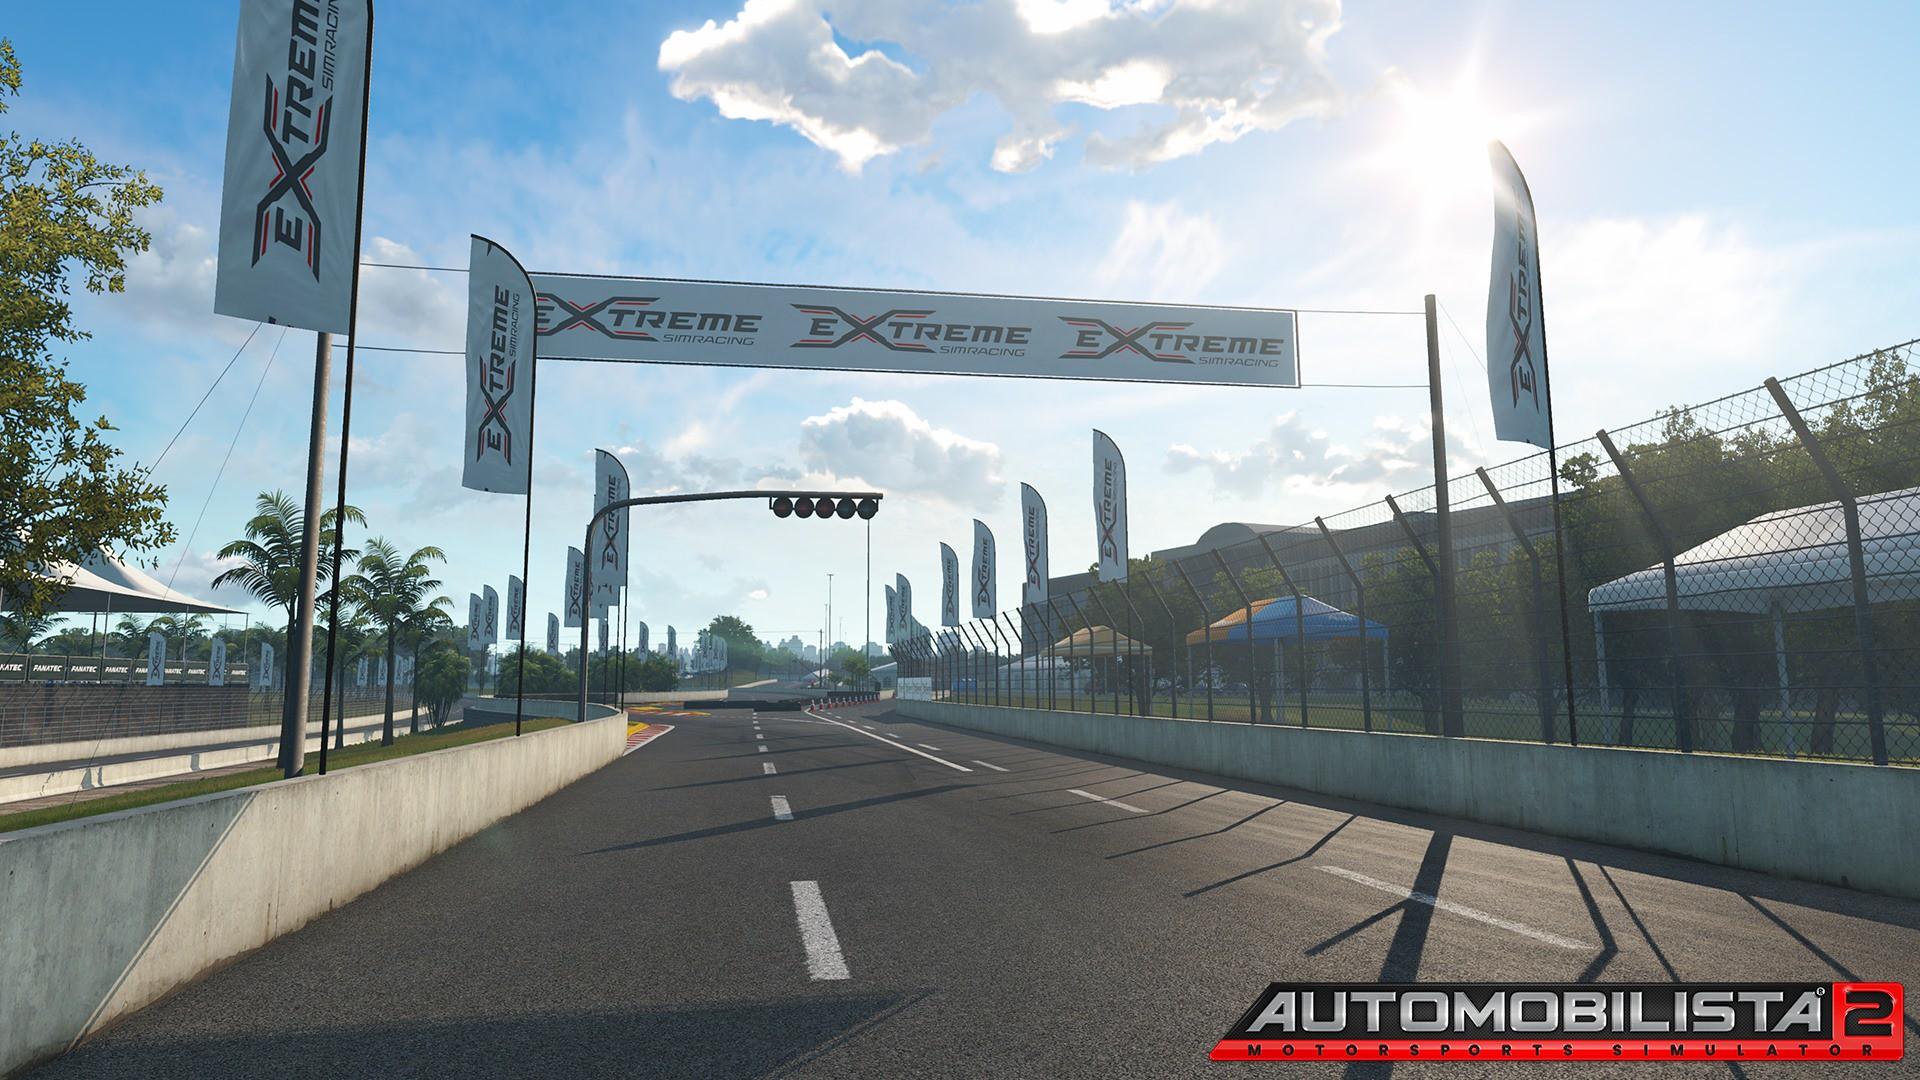 4 Automobilista 2 - Update V1.2.2.0